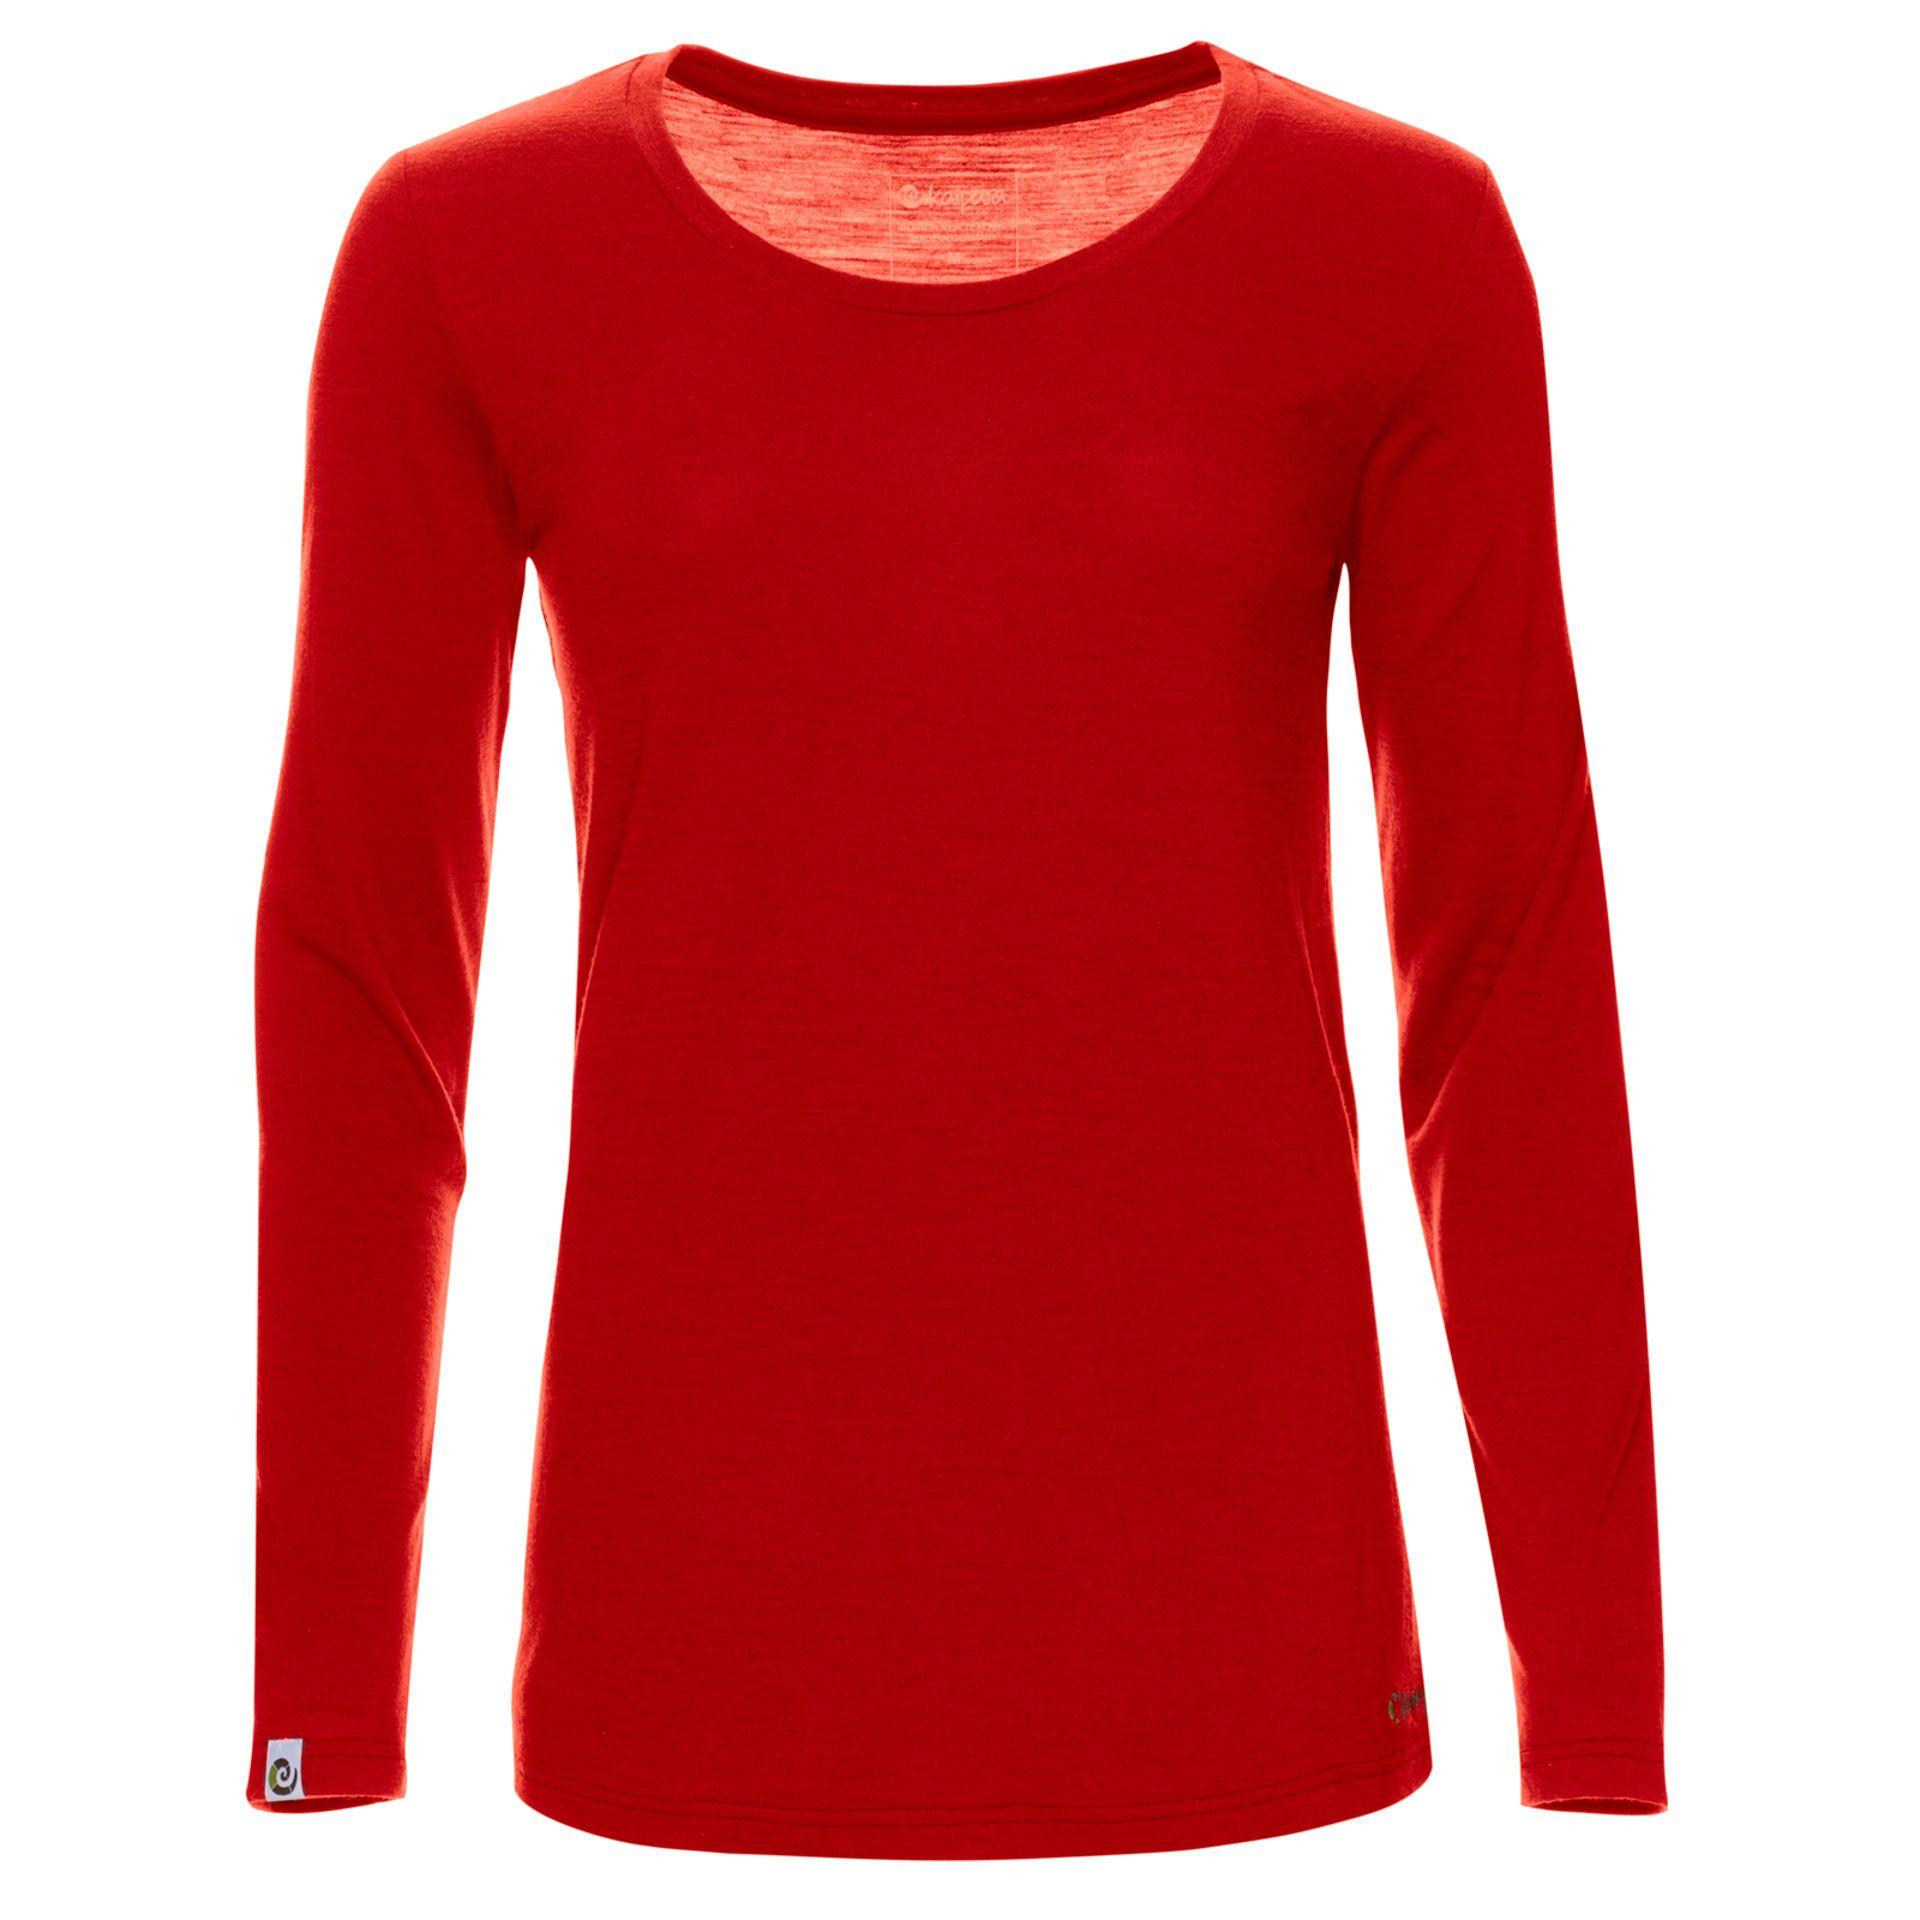 Merino Longsleeve Damen Regular 200 Cherry Red / XL